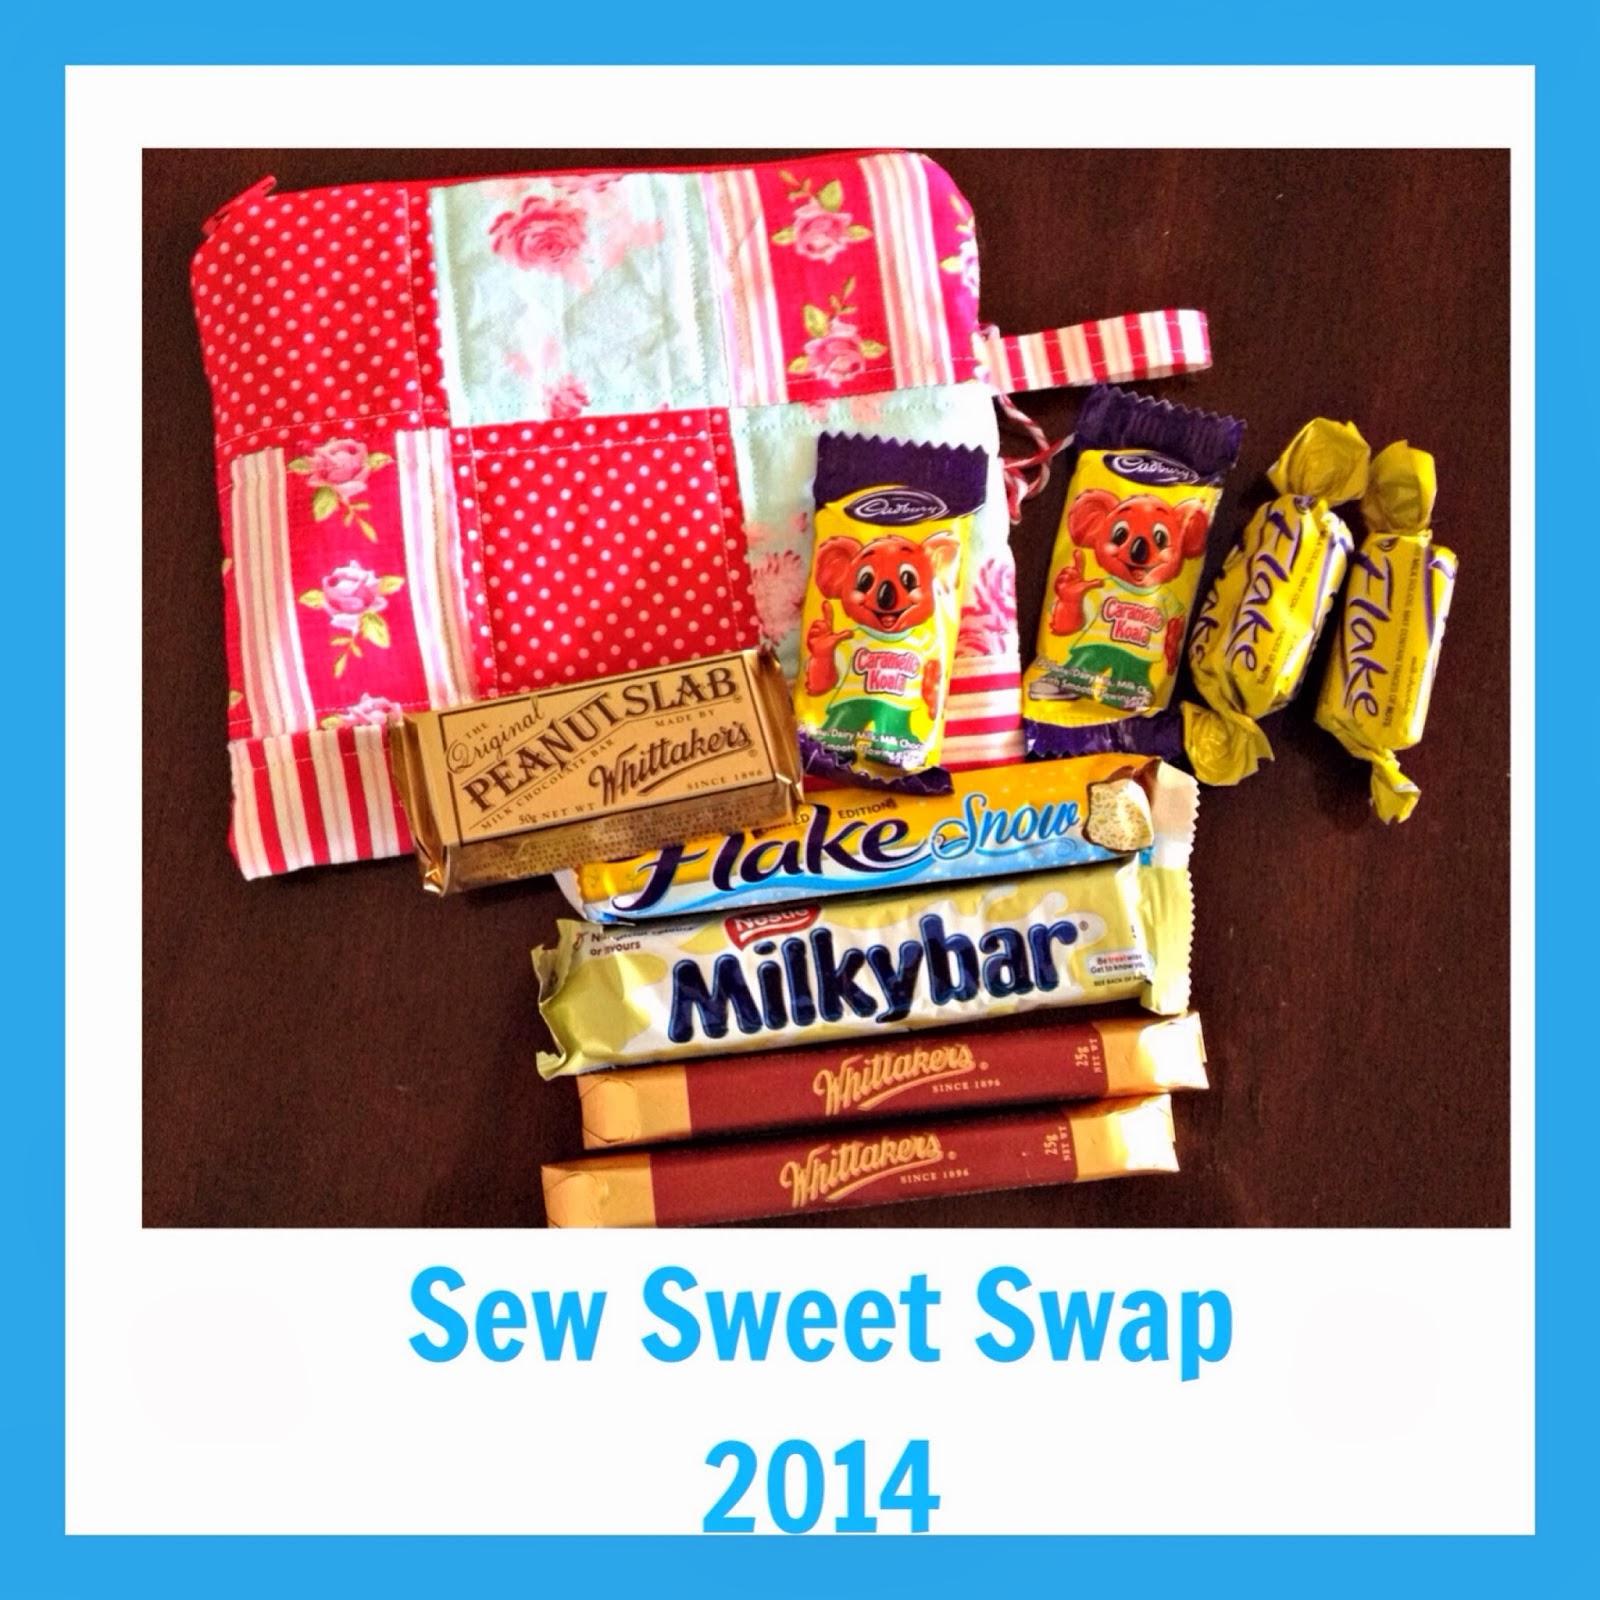 Sew Sweet Swap 2014